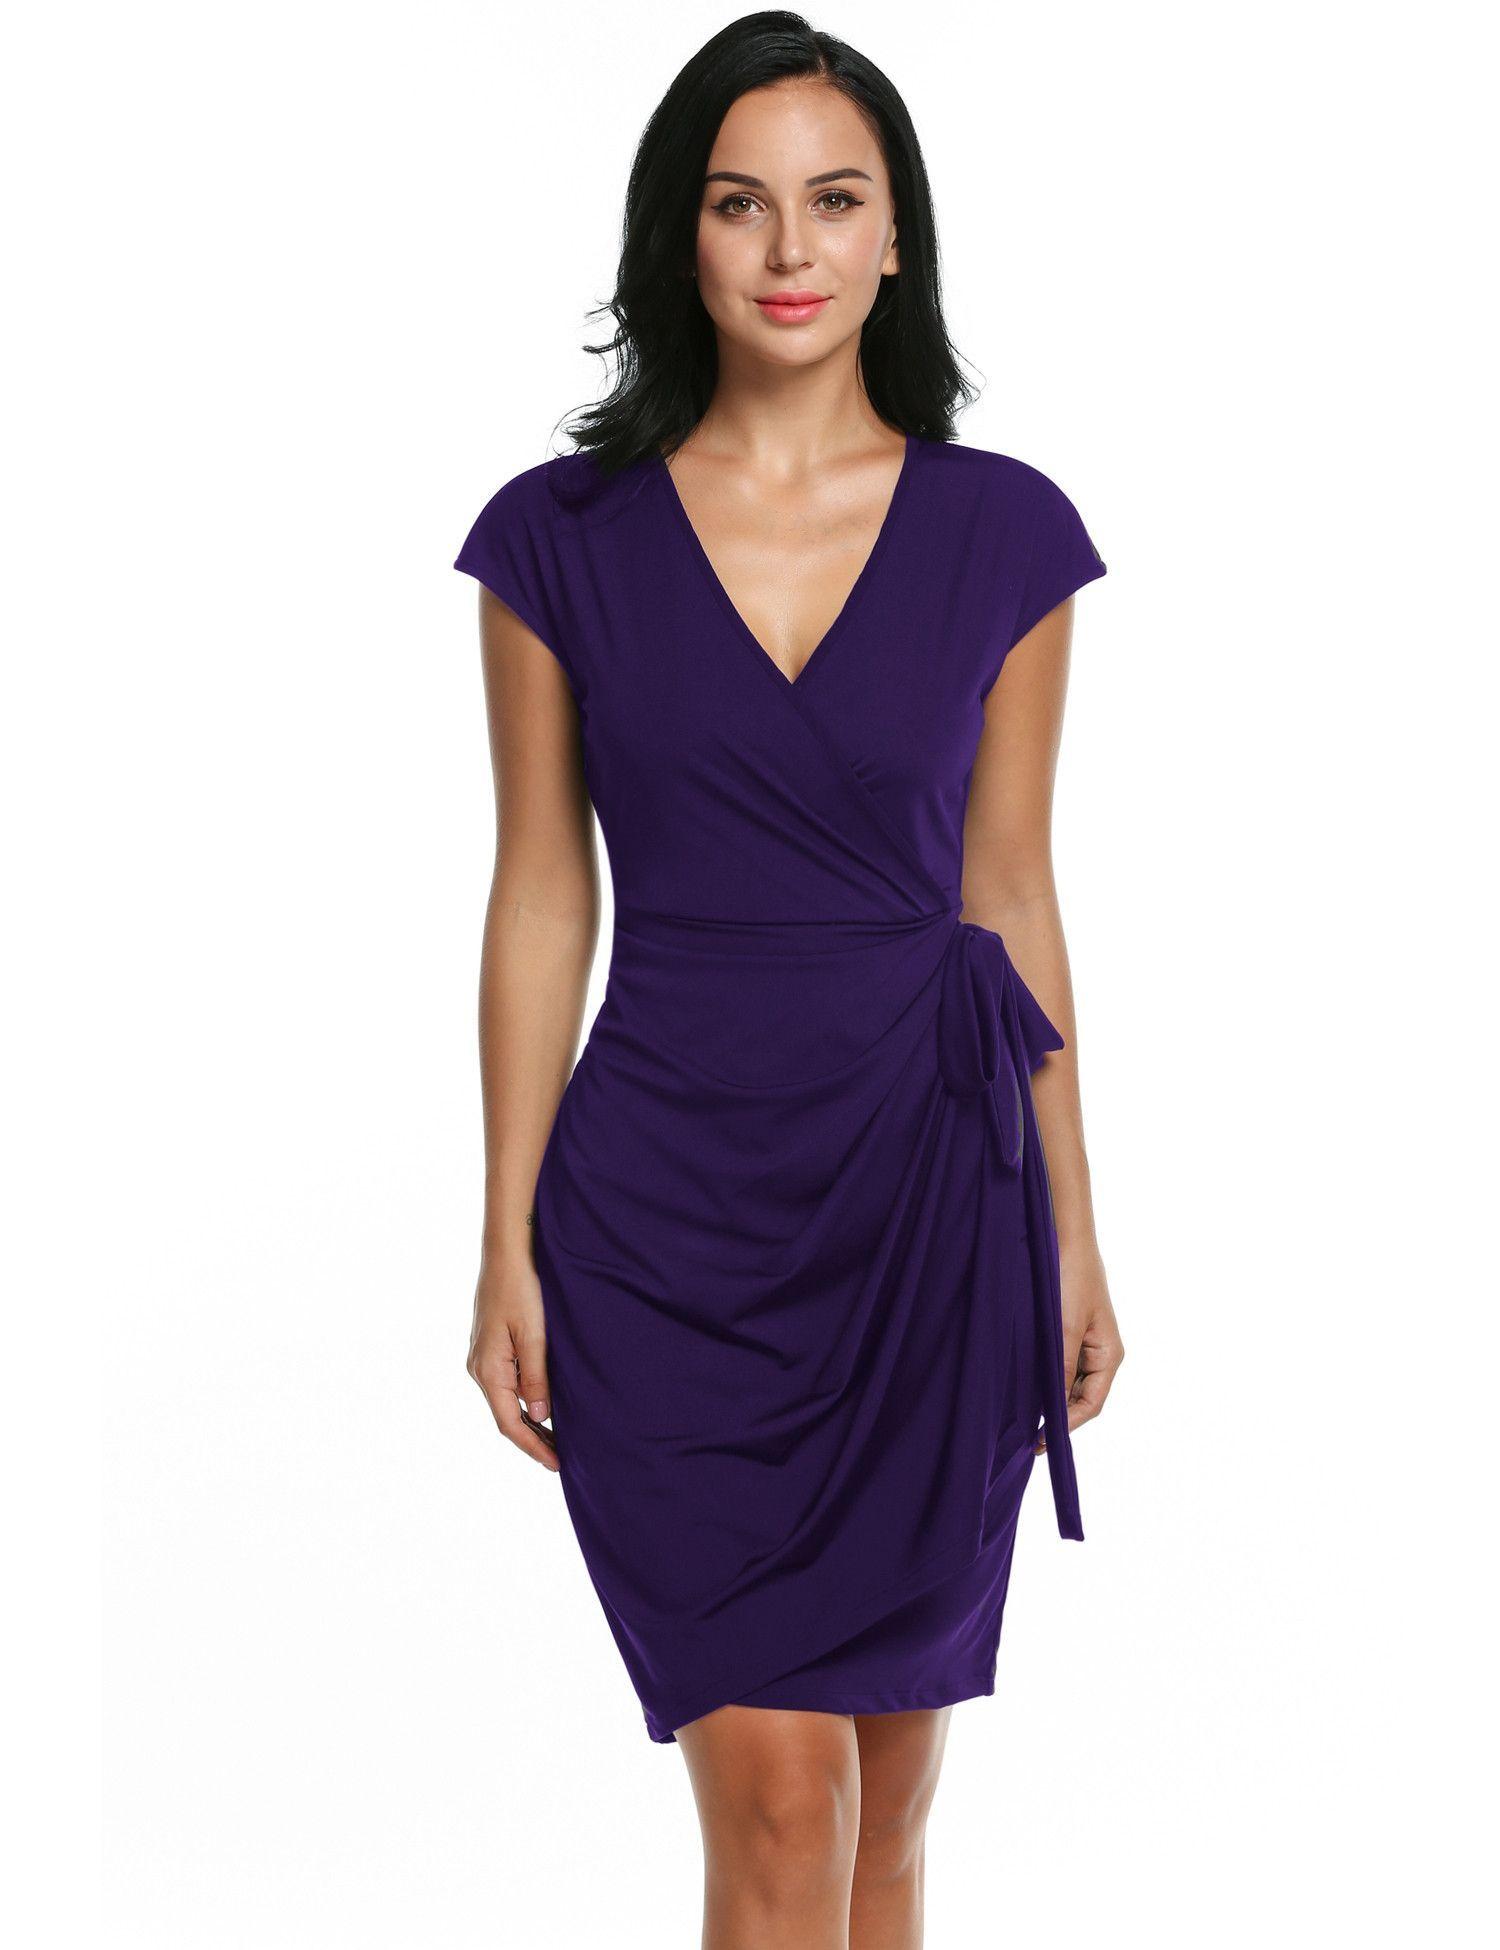 Womens Classic Cap Sleeve V-Neck Draped Tie-Belt Cocktail Wrap Party Dresses